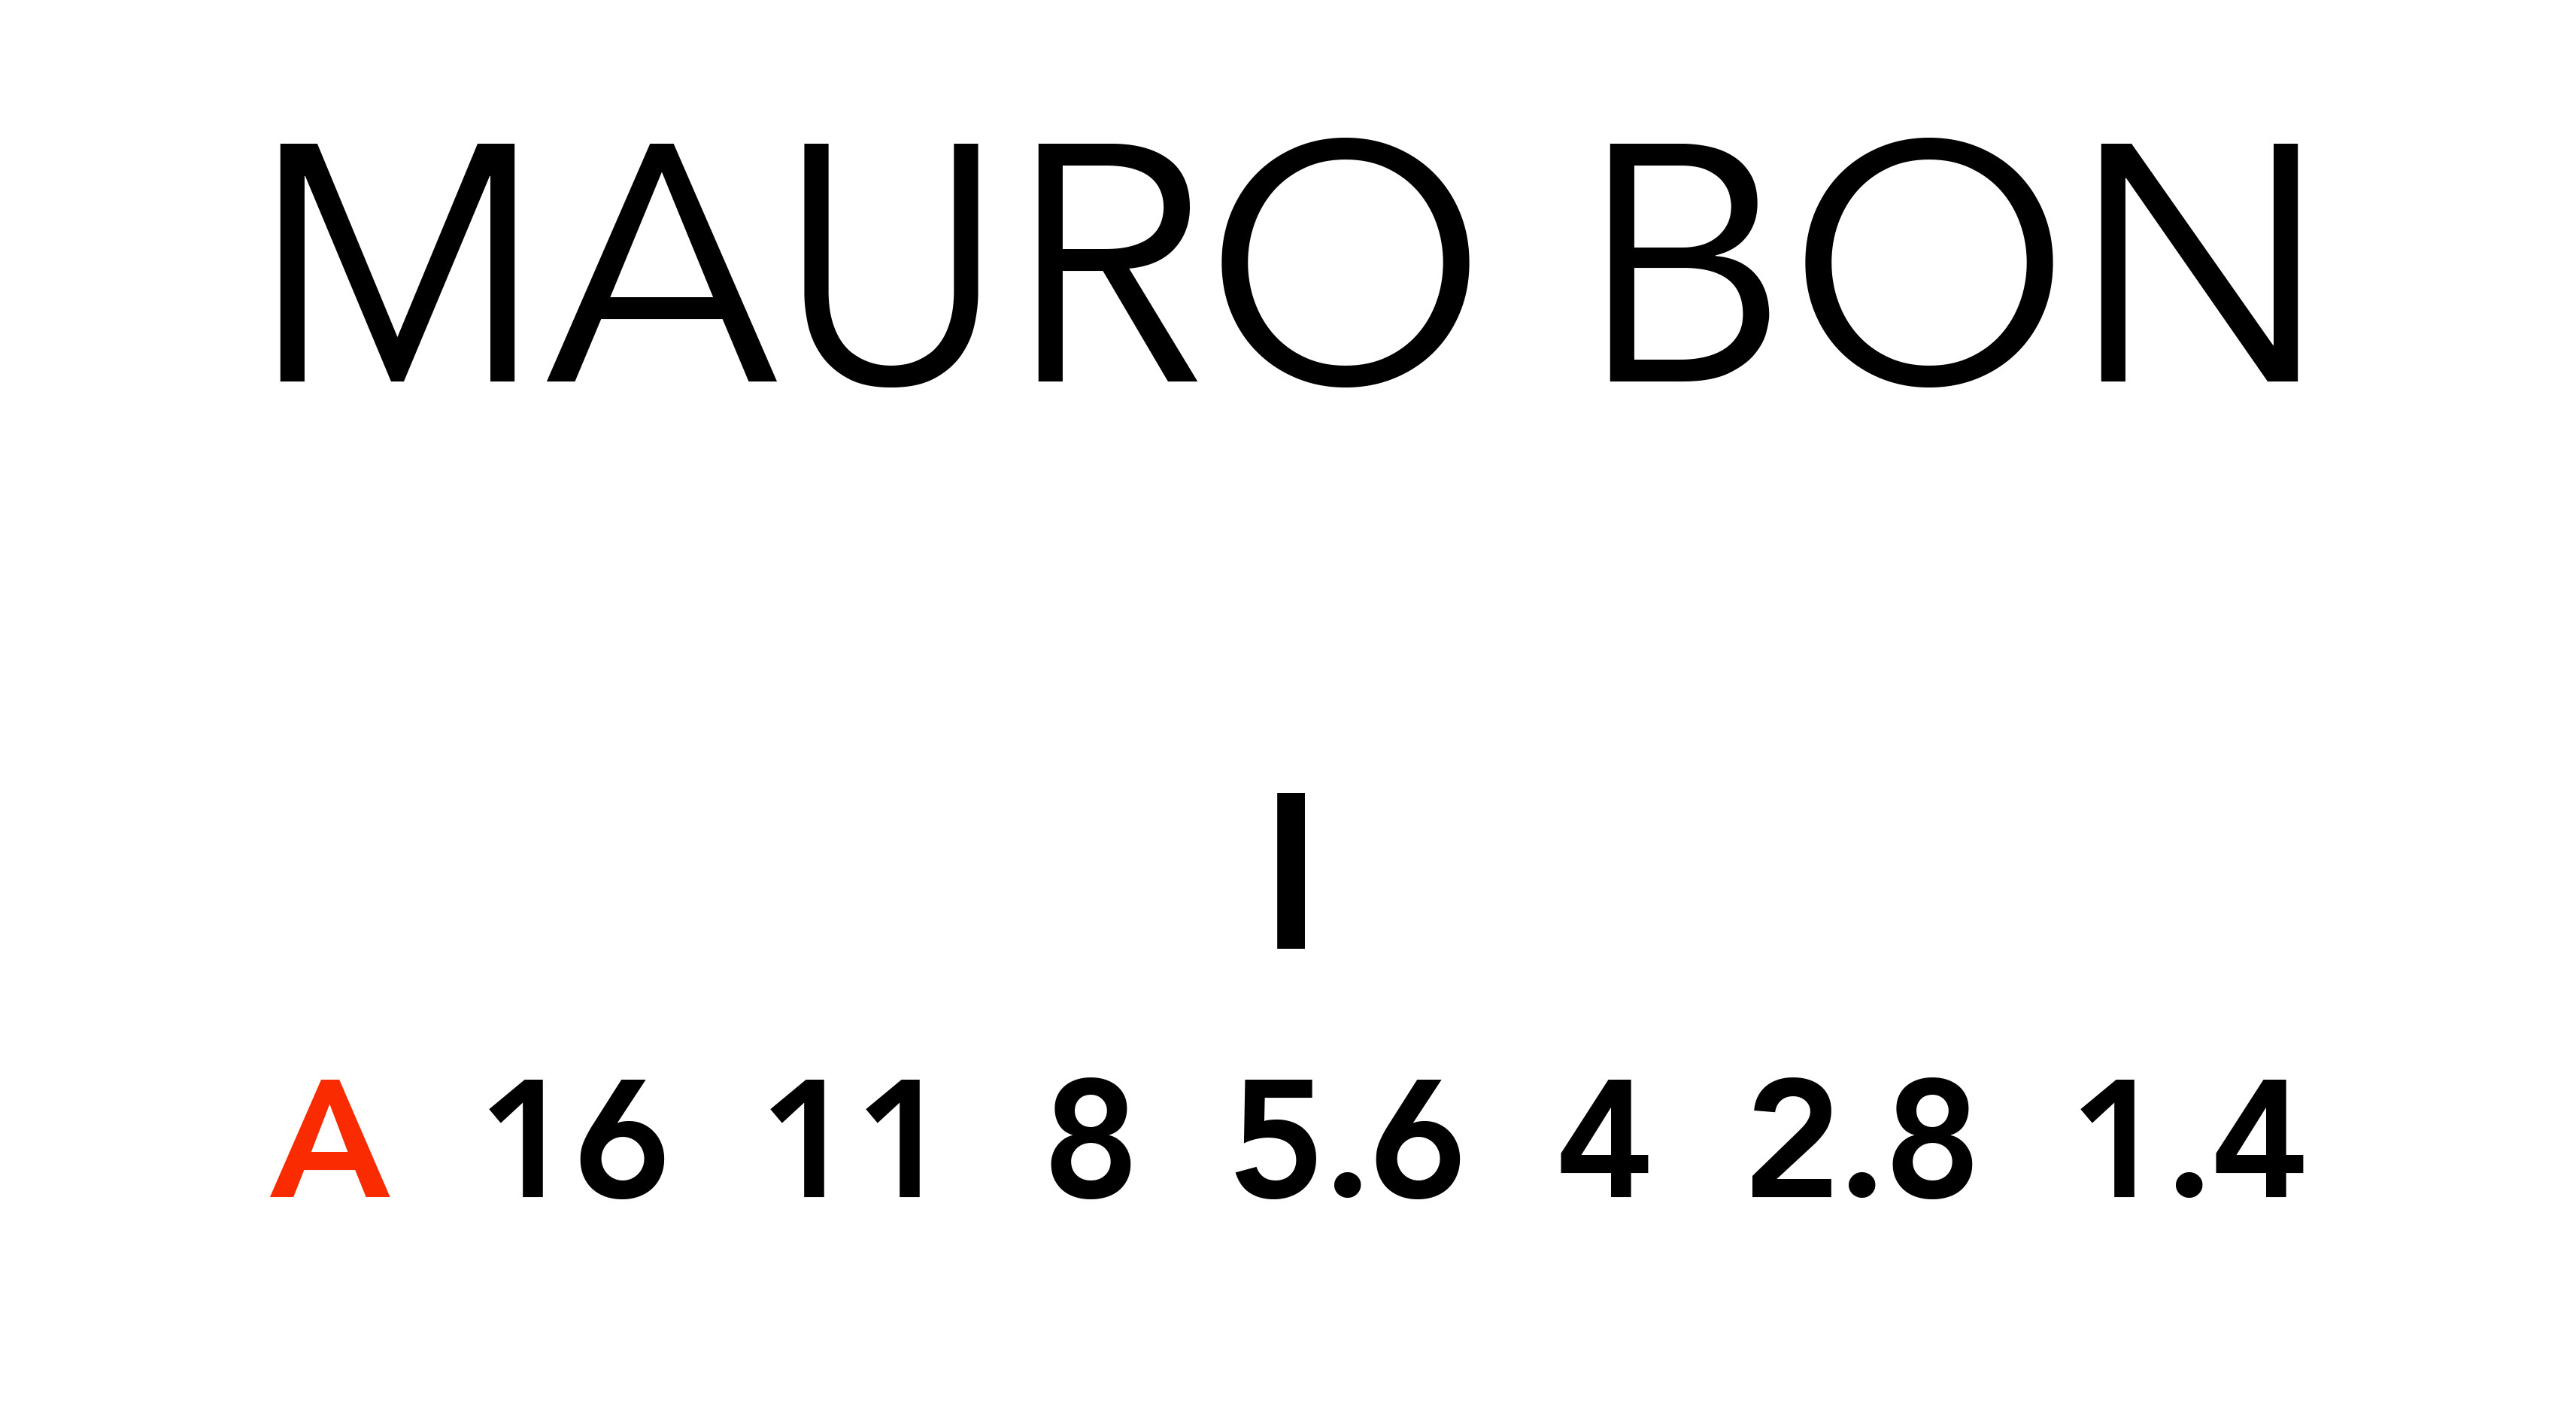 Mauro Bon